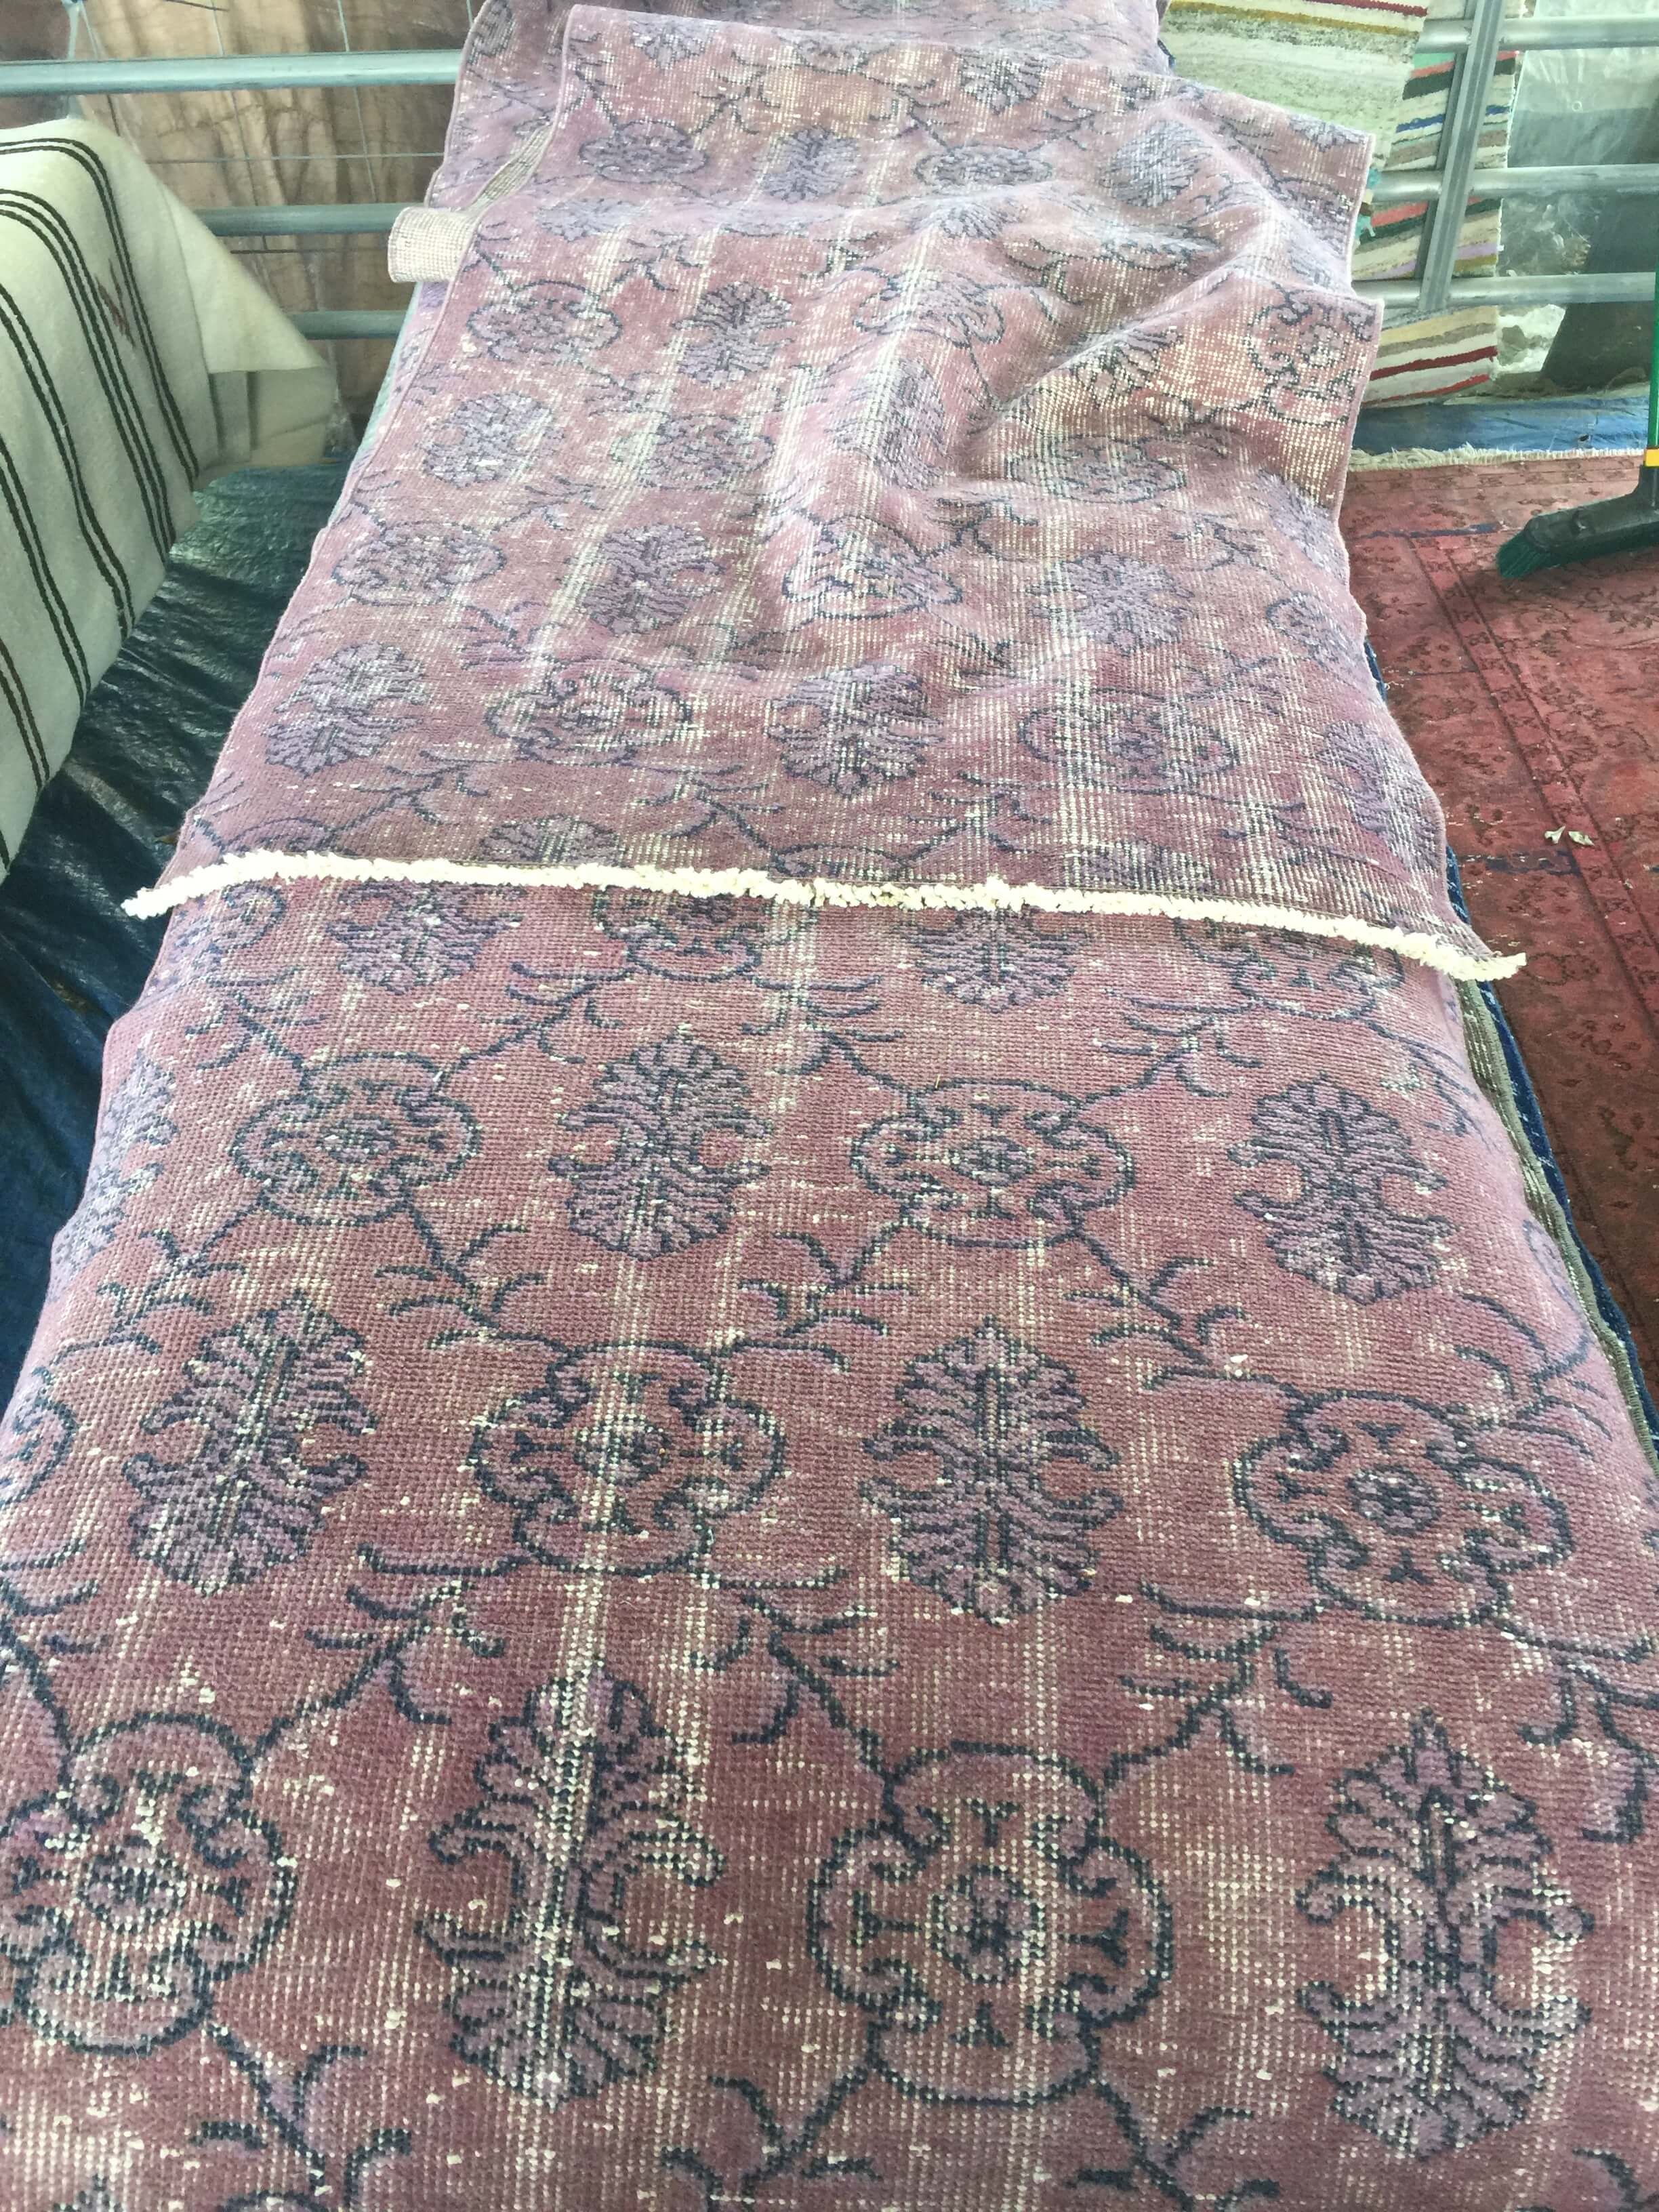 Purple antiqued runner rug at Roundtop, TX #runner #rug #purplerug #roundtop